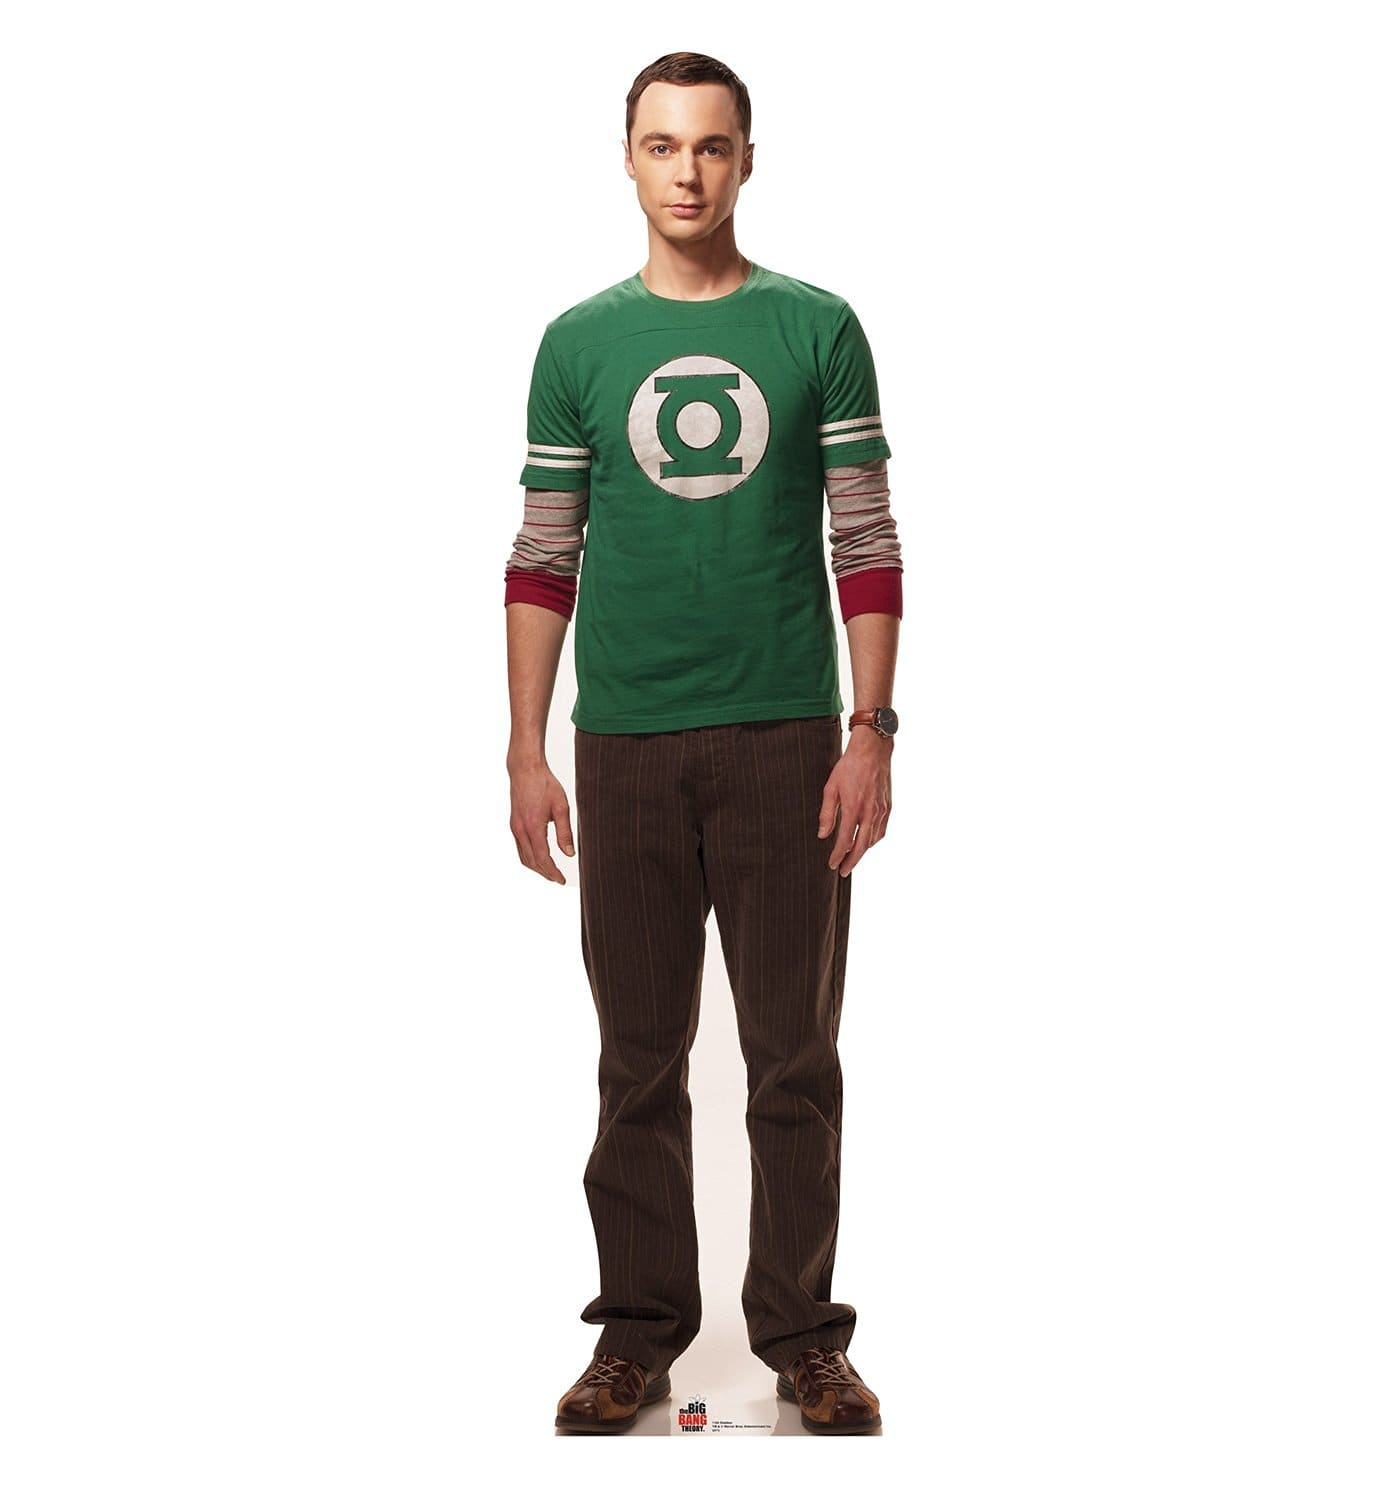 Sheldon Cooper HD pics